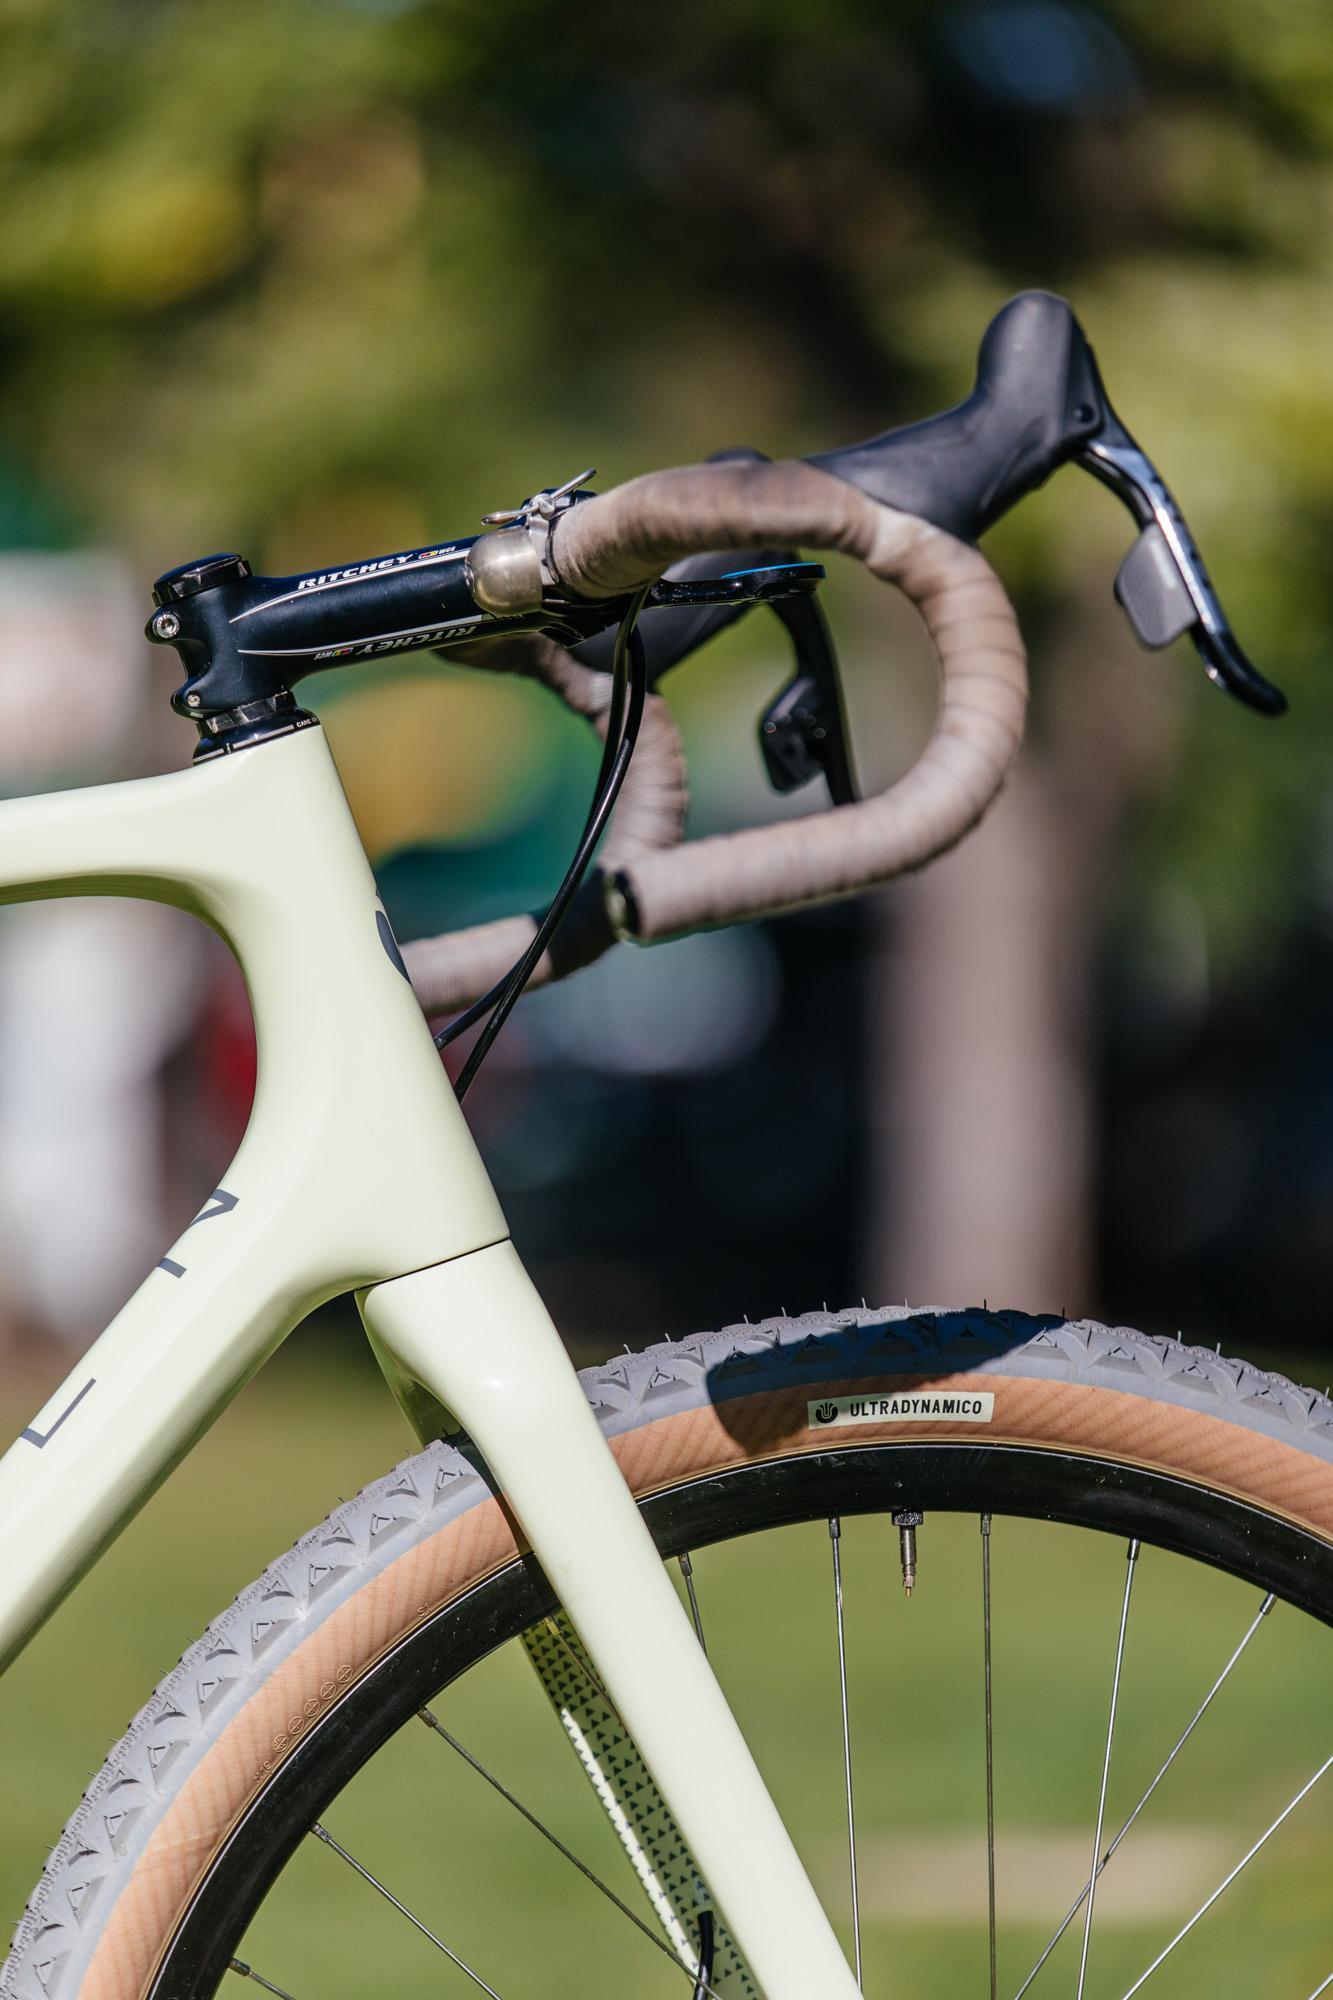 Patrick's Ultradynamico OPEN UP Gravel Race Bike